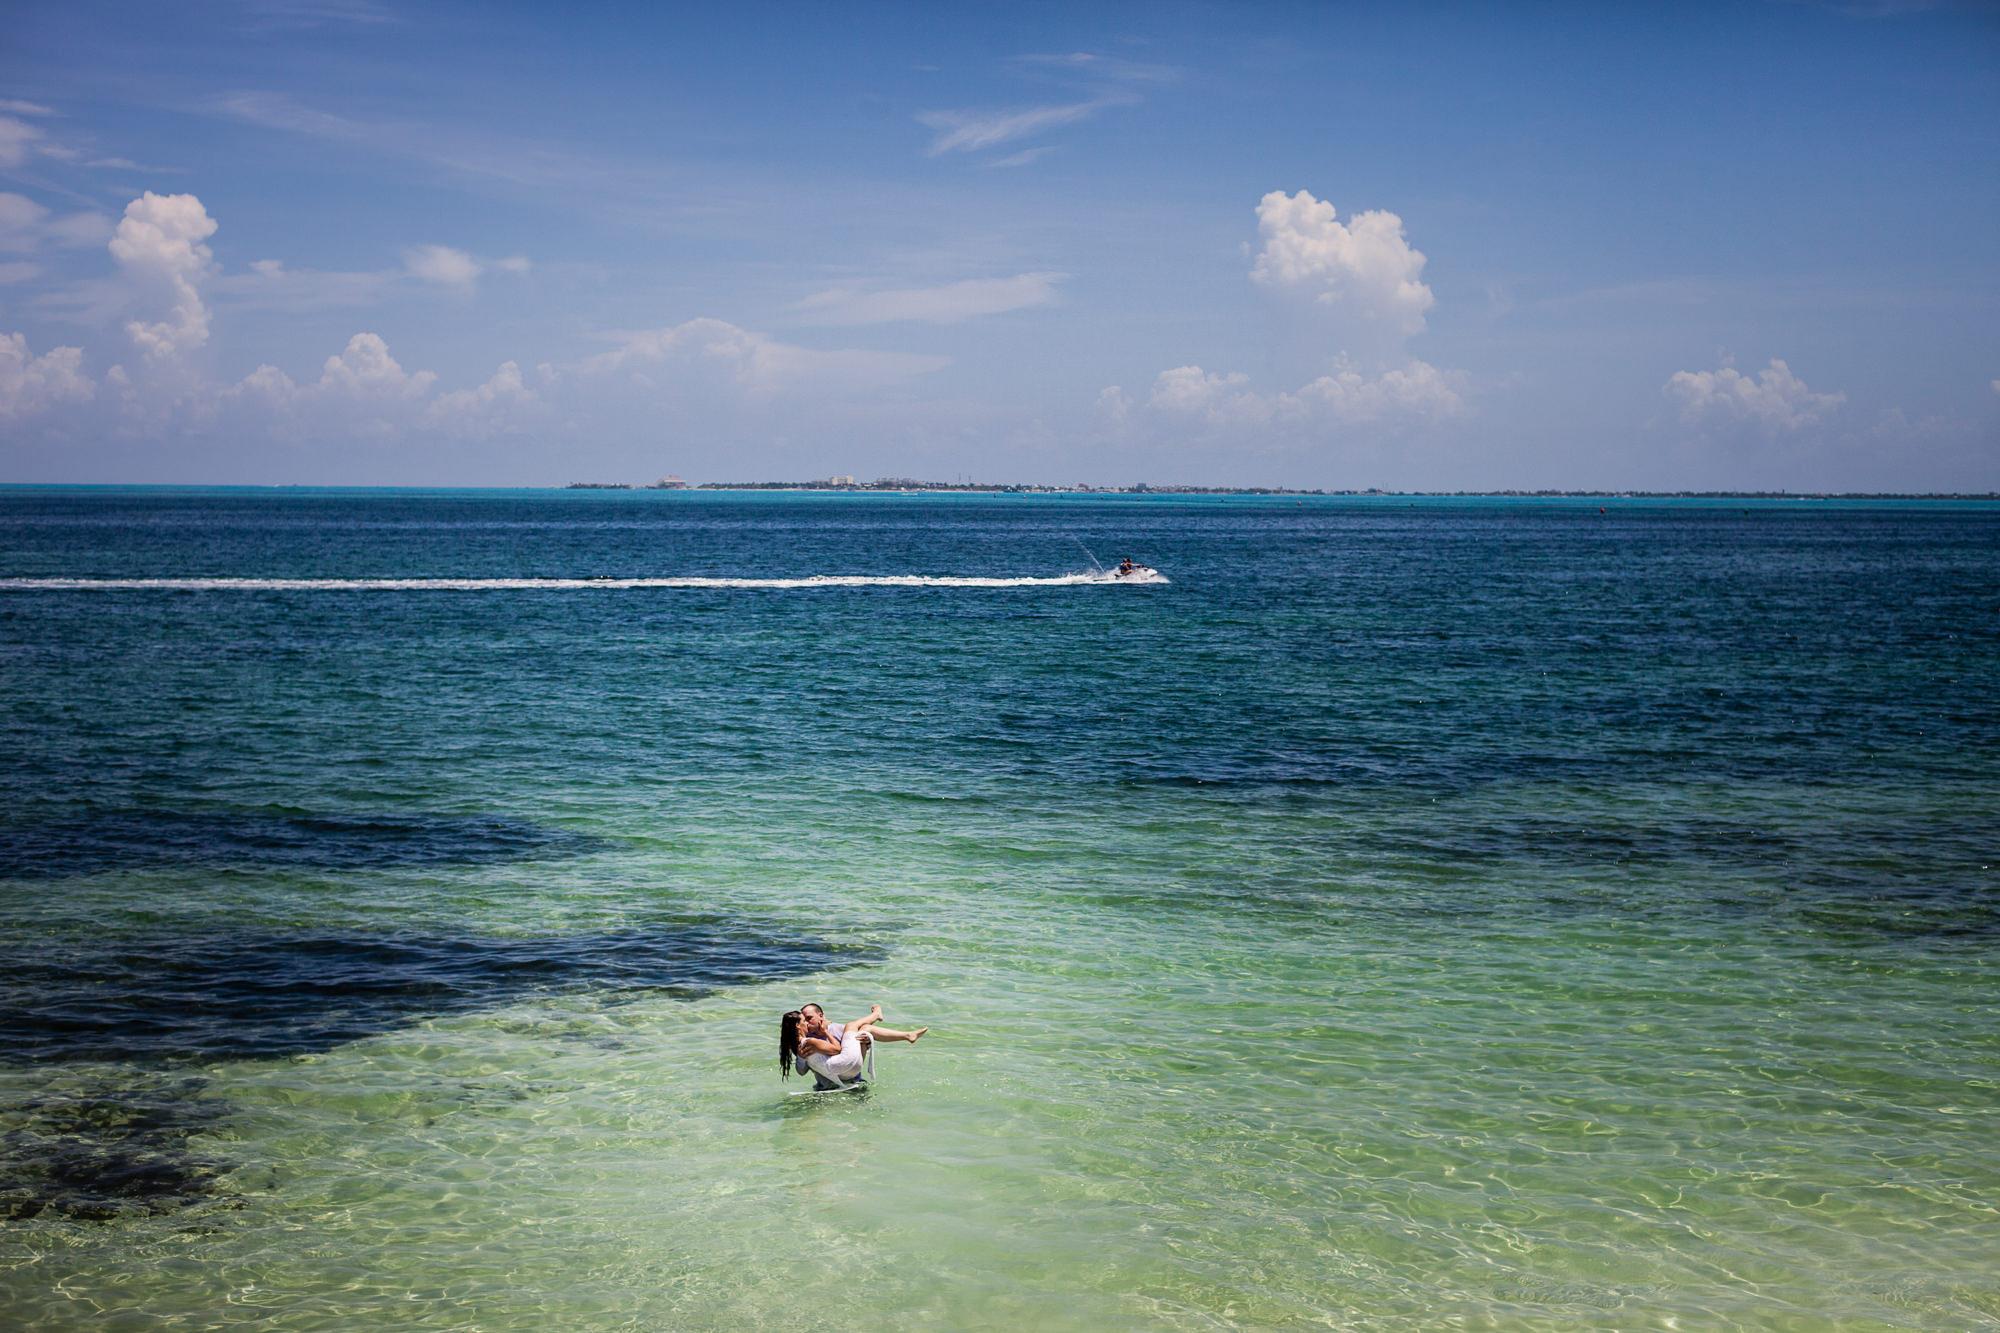 Groom carrying bride in the ocean - photo by Jag Studios